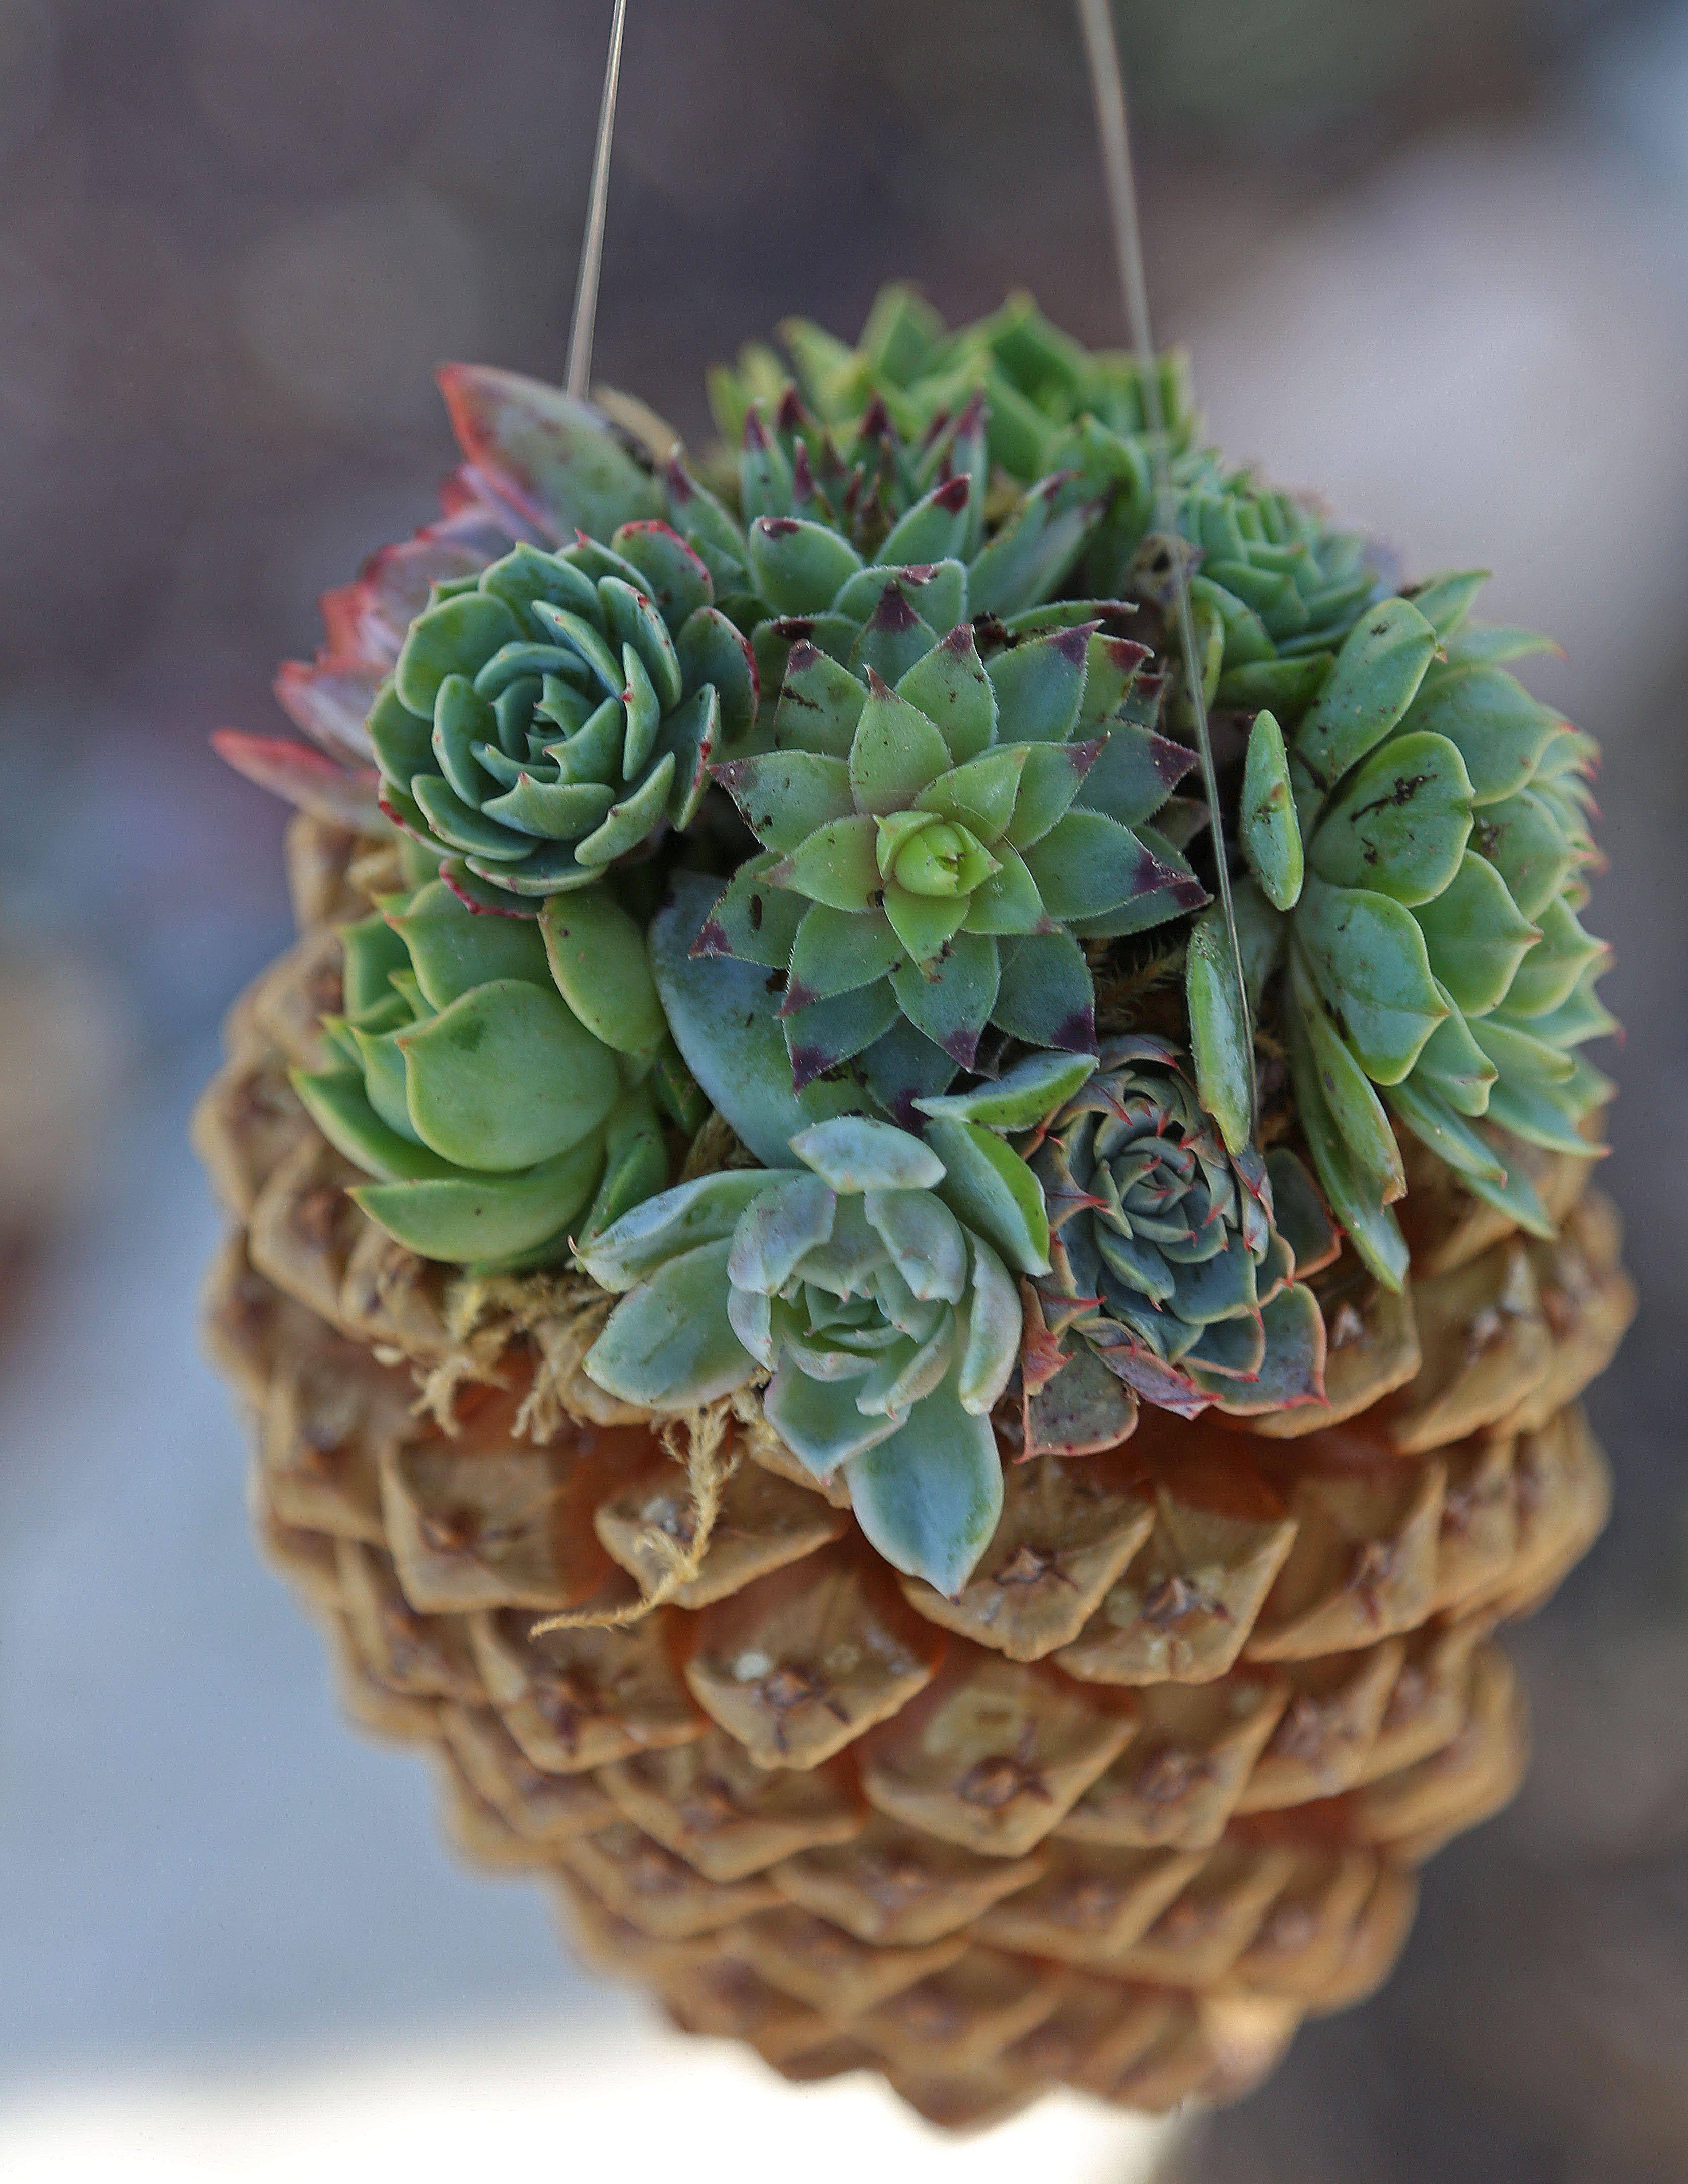 Unique diy home garden decor with a shoe planter and succulents - Hanging Pine Cone Succulent Planter